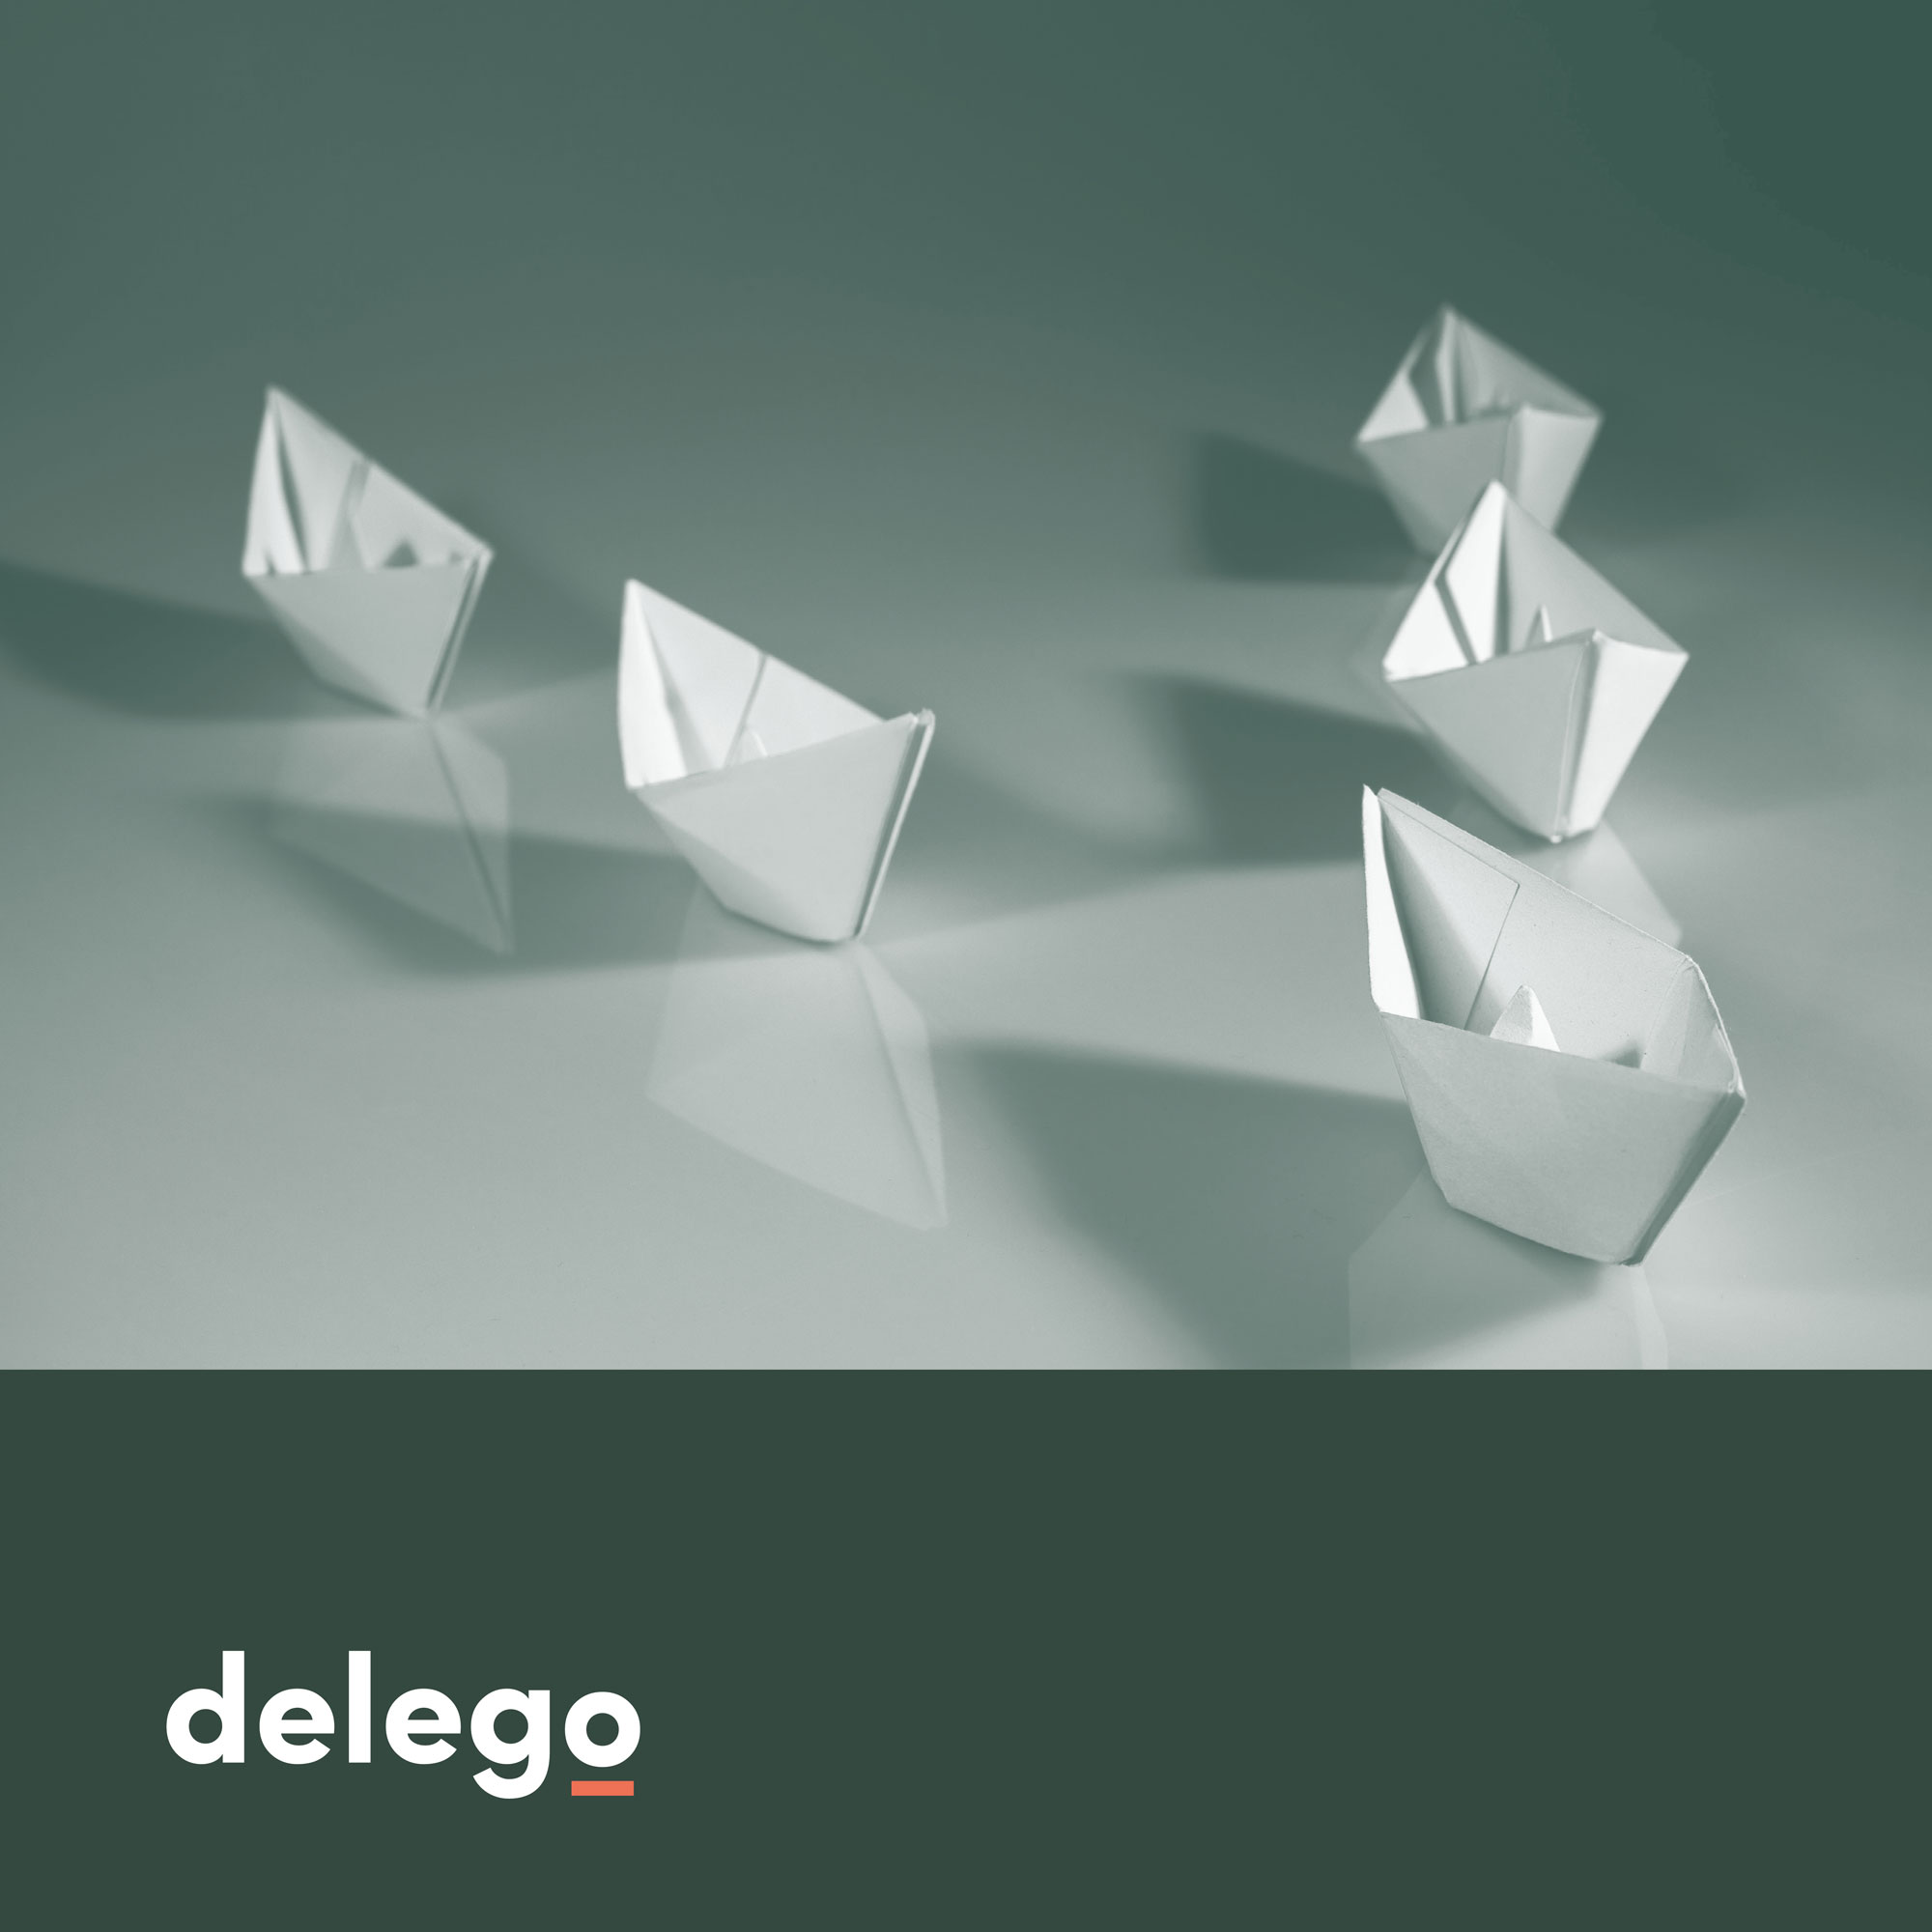 Delego_12